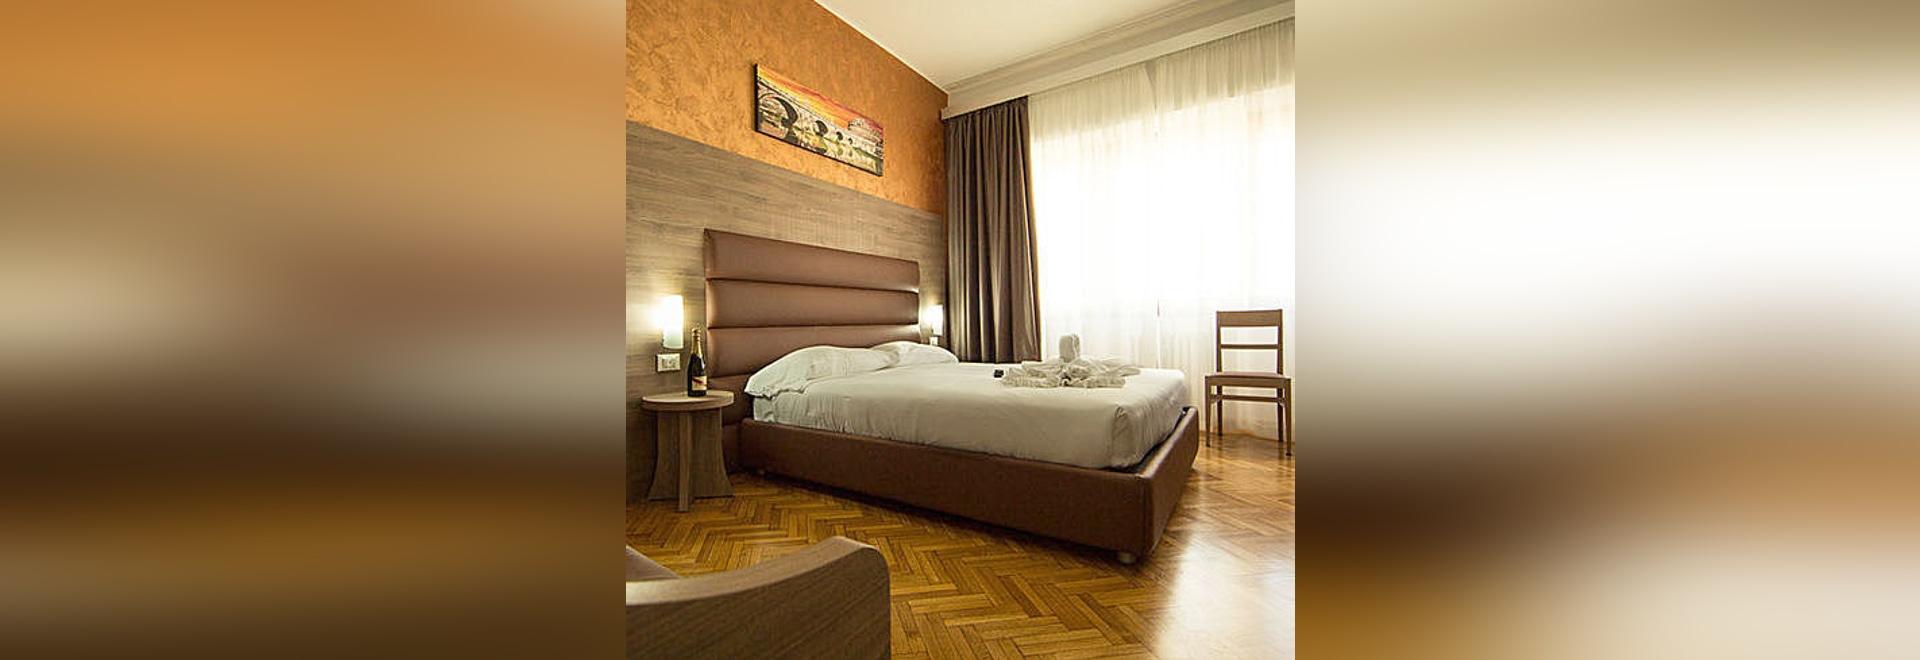 HEADBOARD MODEL FASHION for Hotels - by Mobilspazio